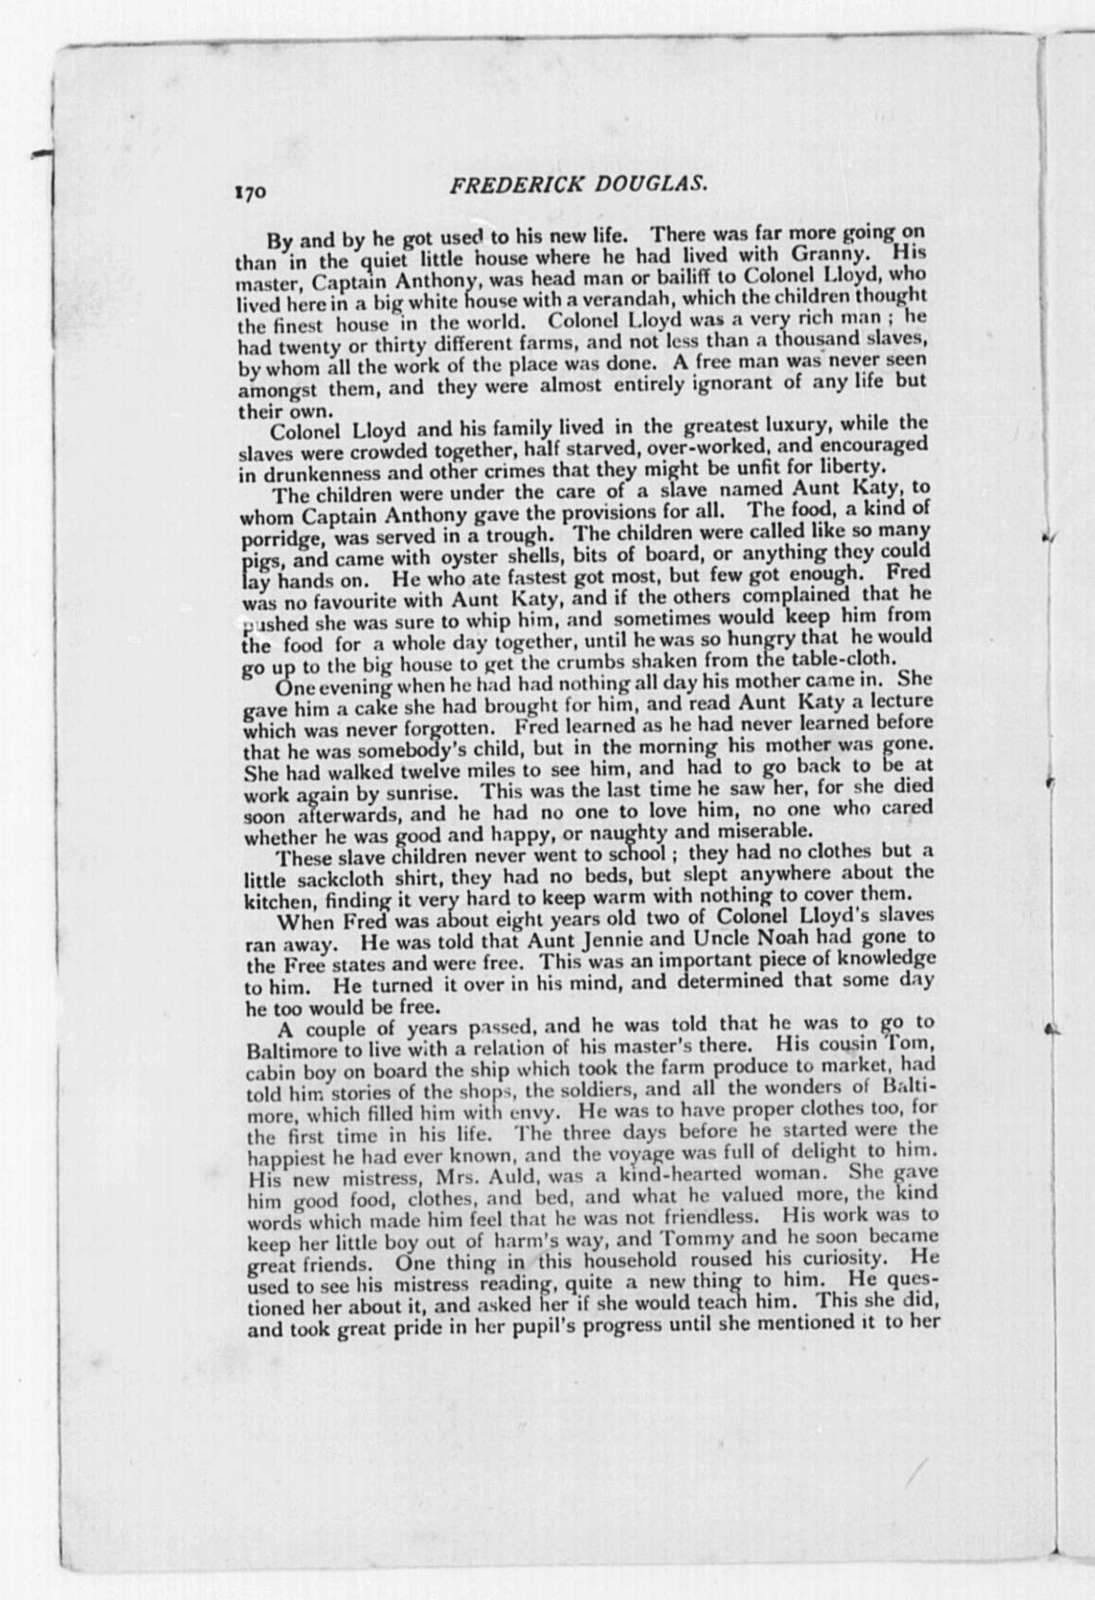 Douglass, Frederick (General) - Folder 3 of 9